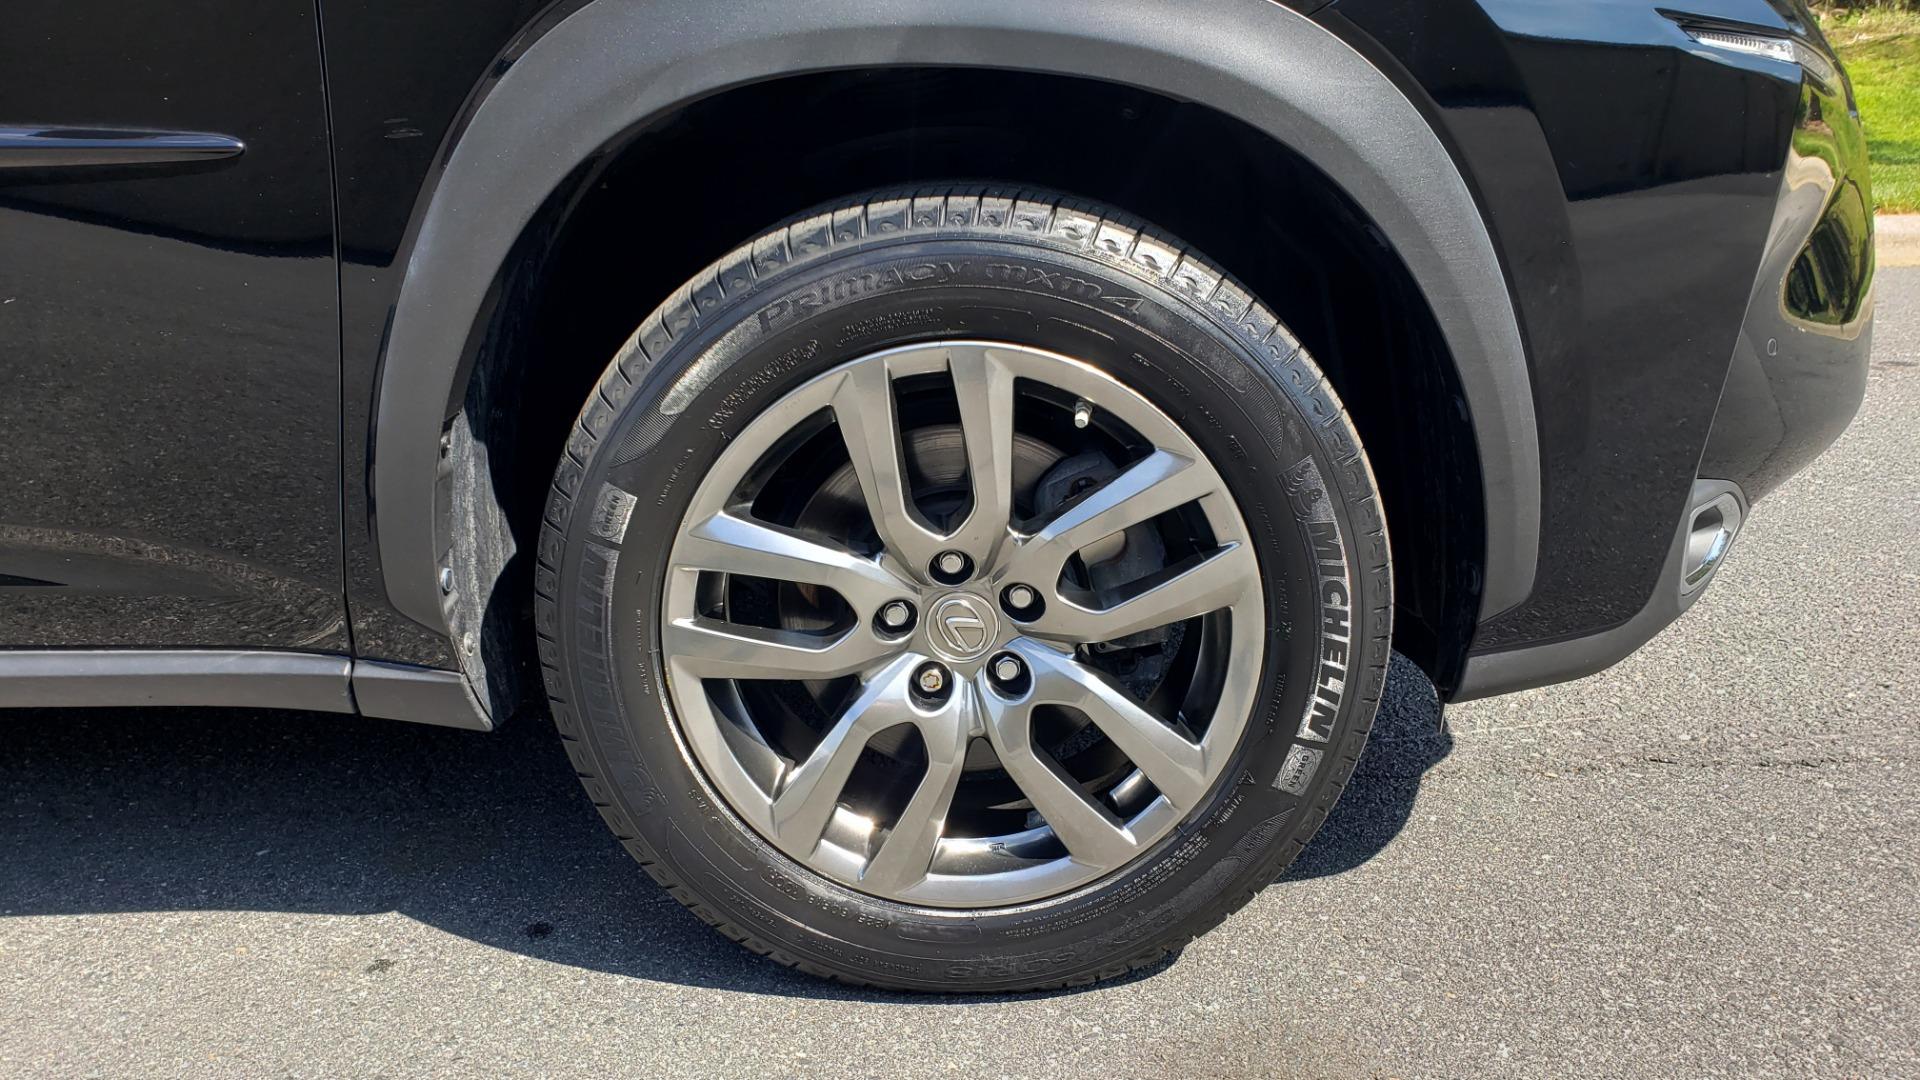 Used 2016 Lexus NX 200T PREM PKG / NAV / SUNROOF / PRE-COLLISION / PARK ASST for sale Sold at Formula Imports in Charlotte NC 28227 82